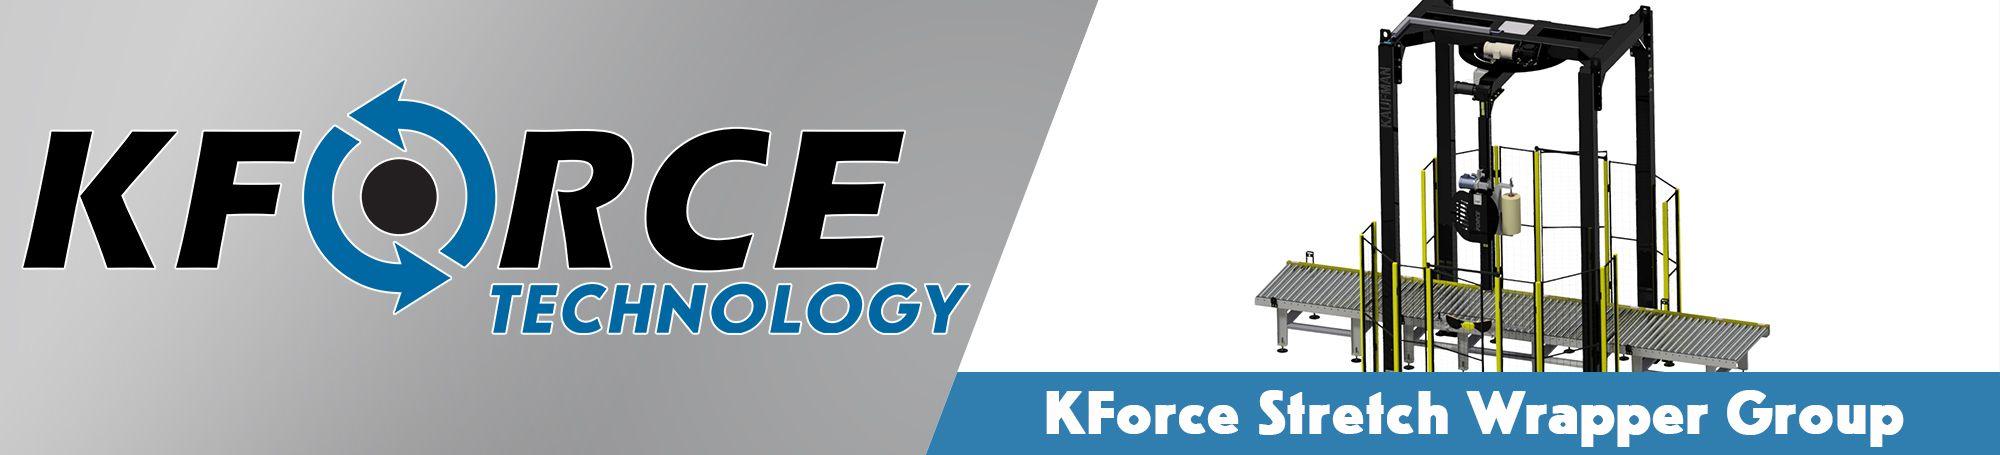 KForce Wrapper Group.jpg